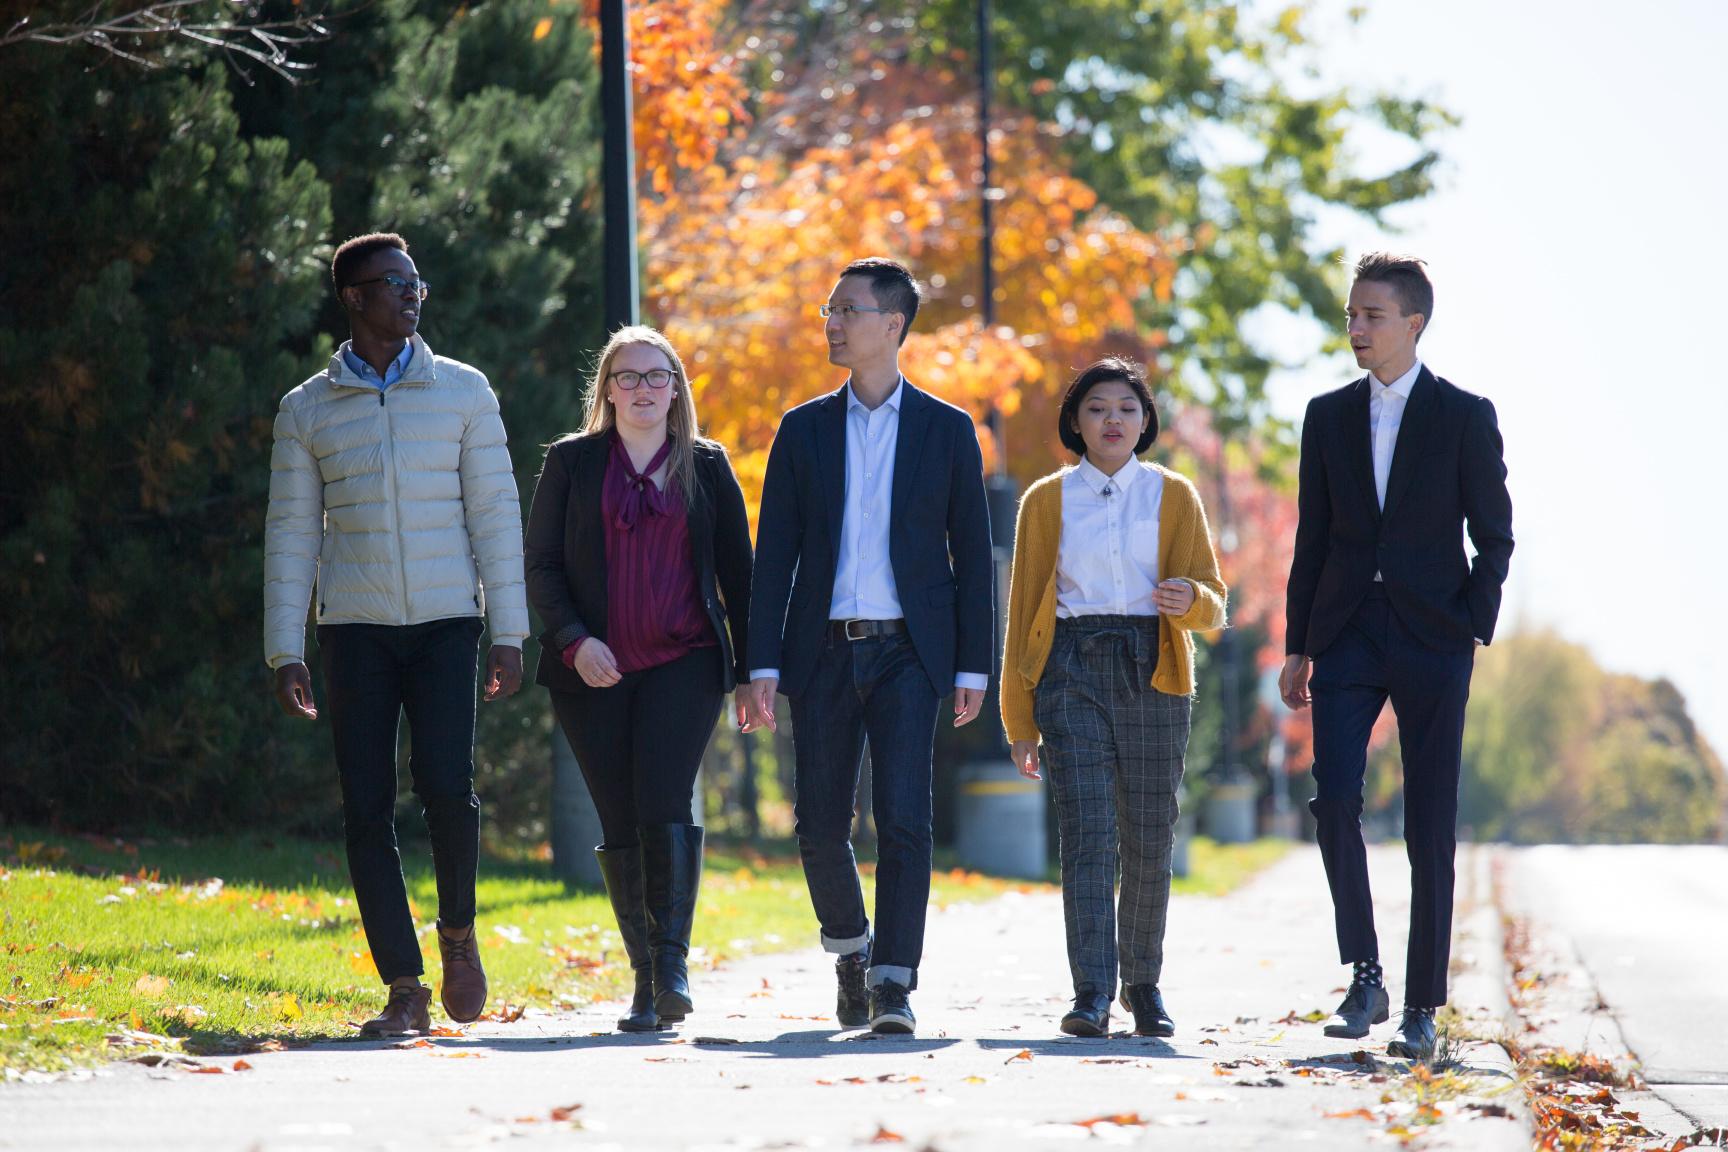 Trent University Durham GTA students walking outside together.